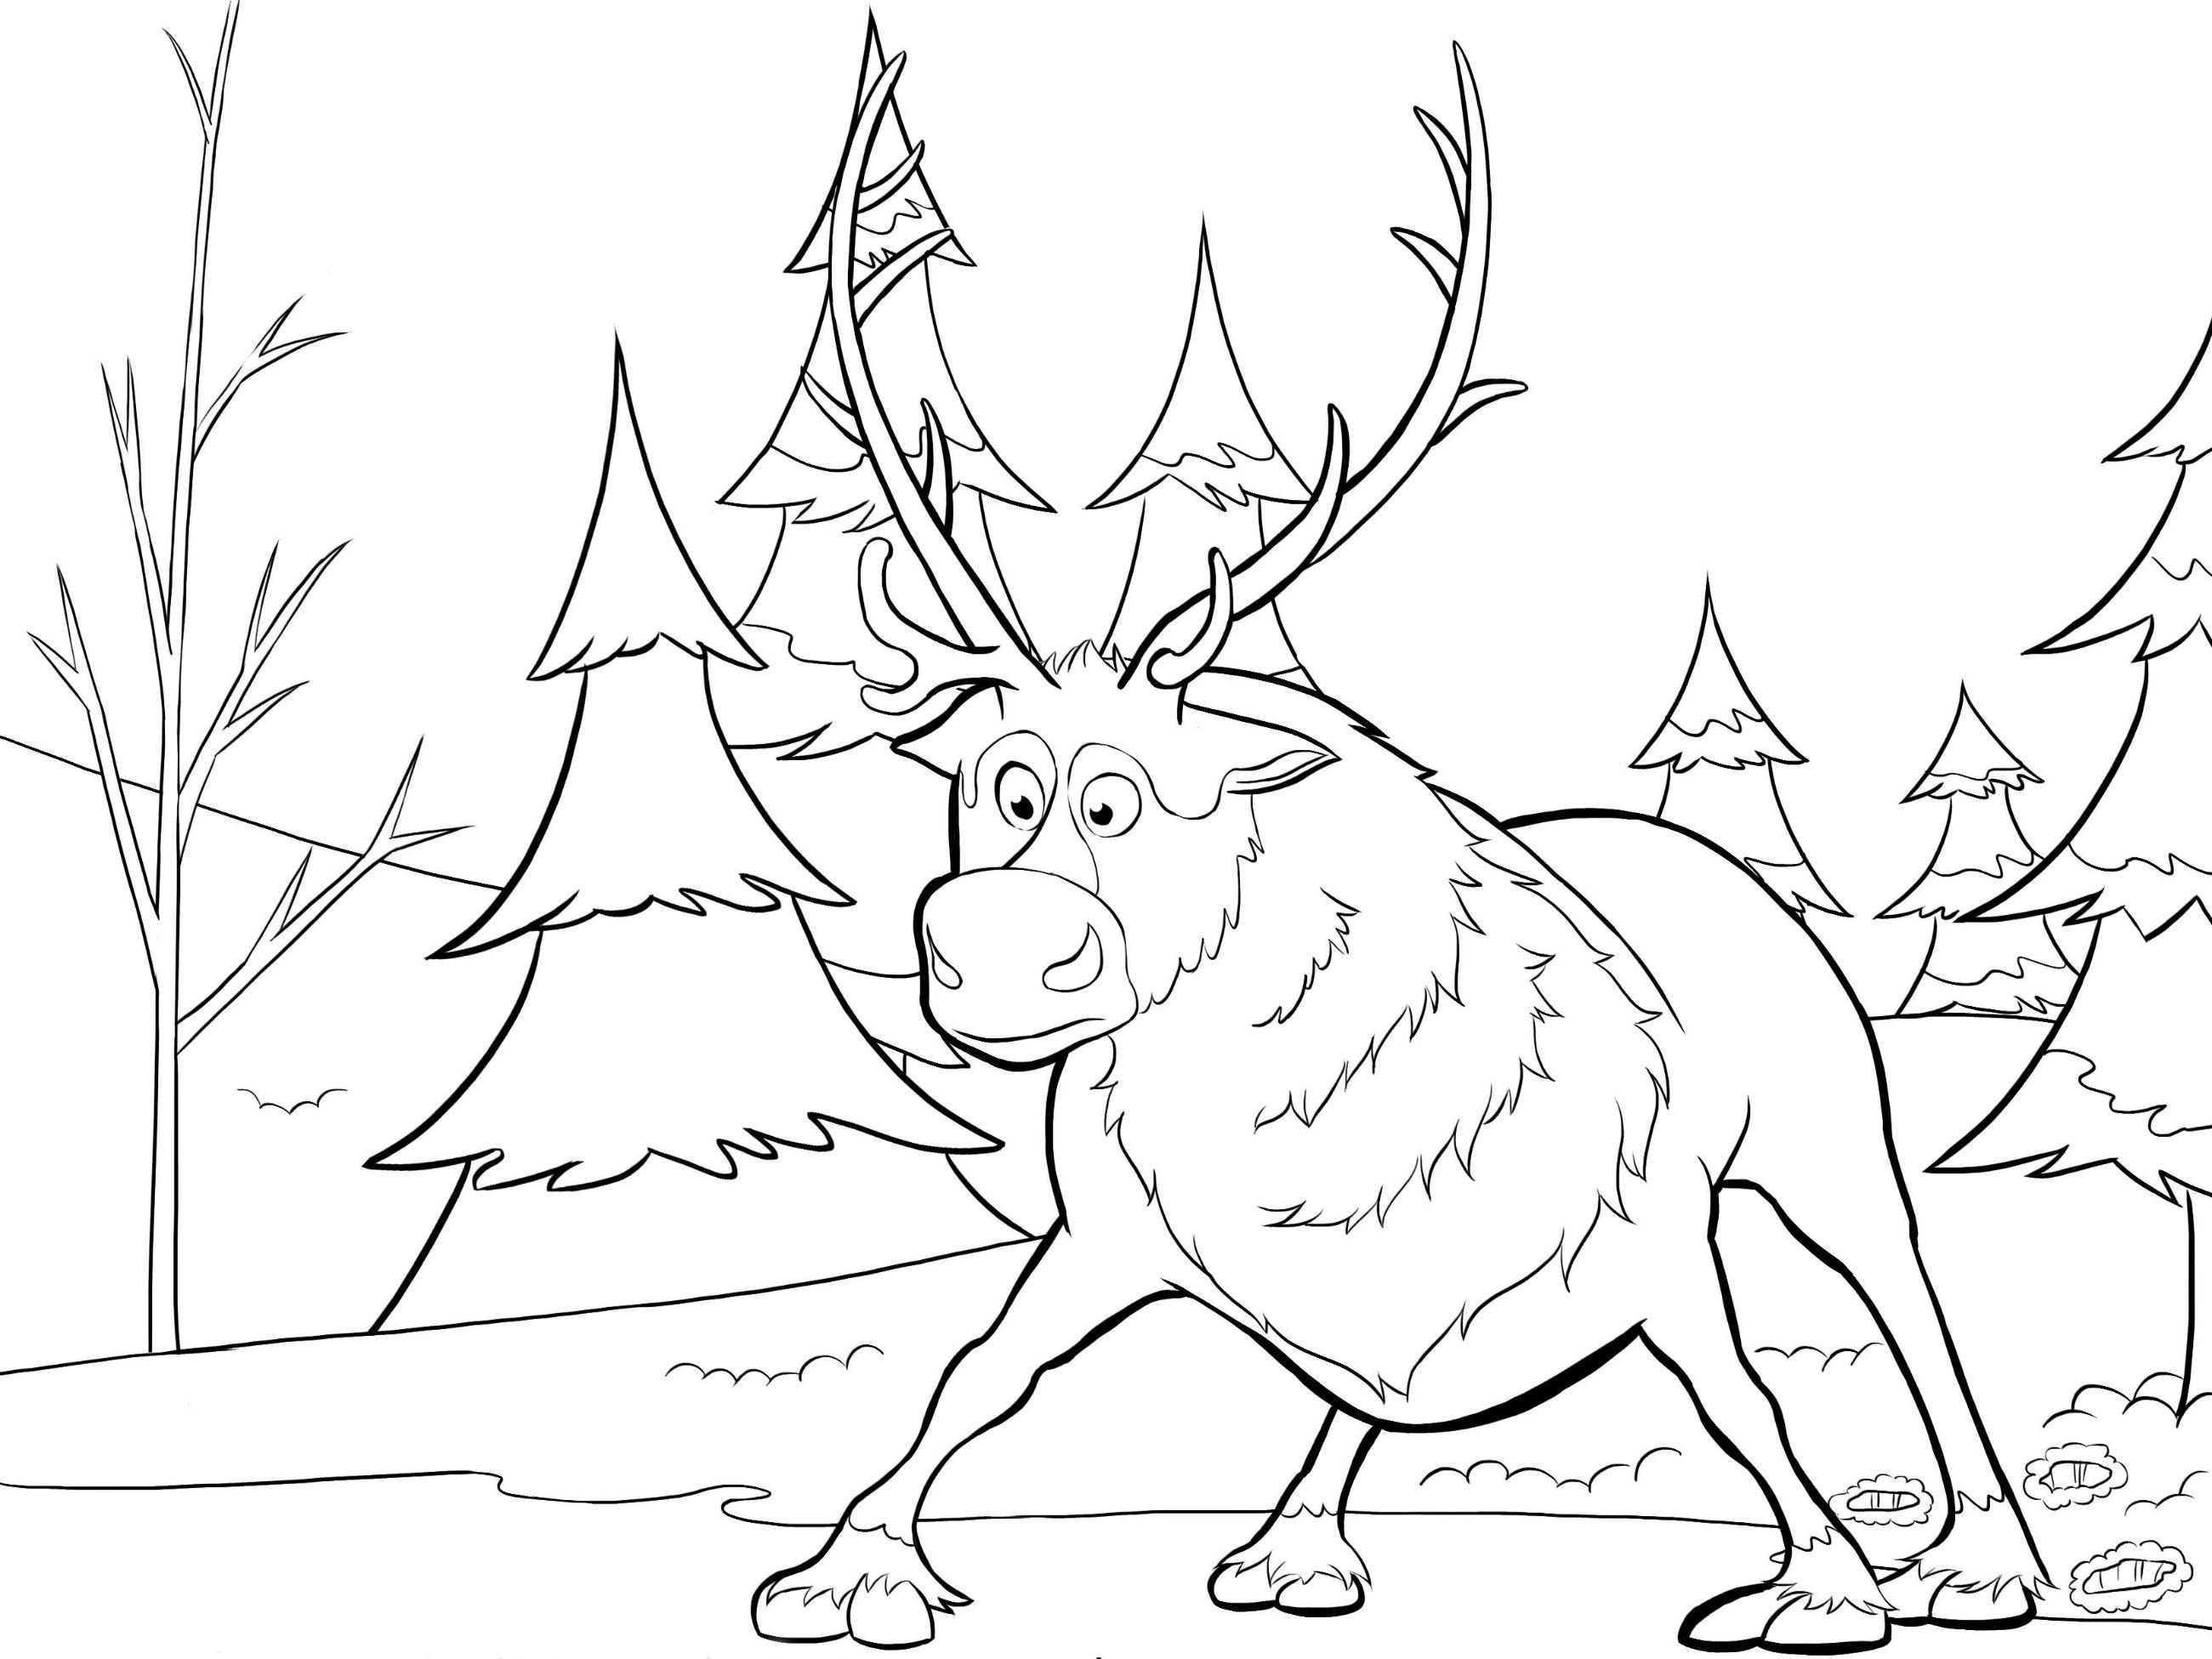 Christmas Coloring Pages Frozen Coloring Elsa Coloring Pages Frozen Coloring Pages